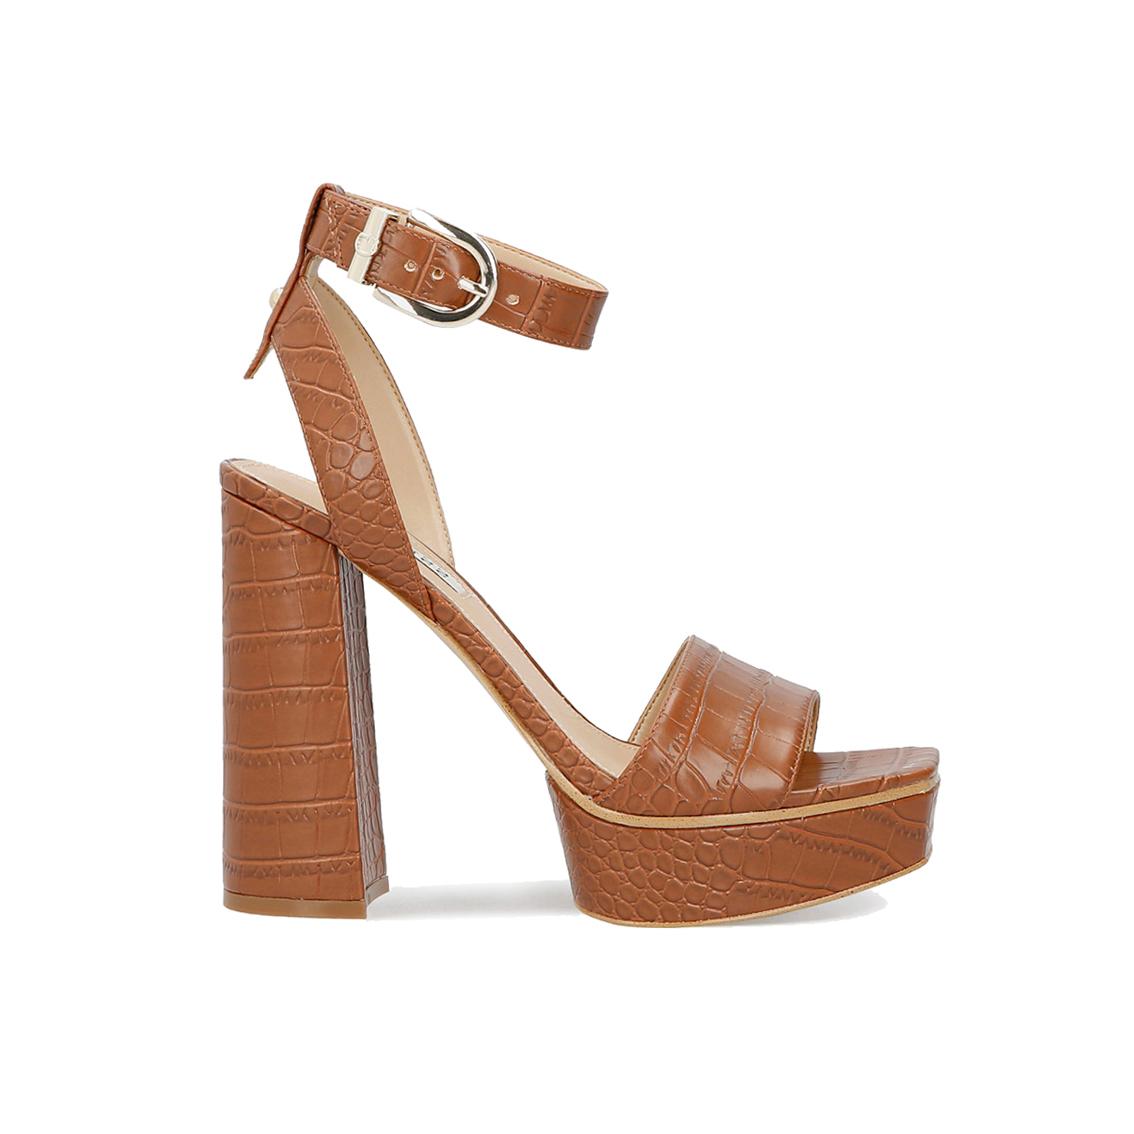 Sandalo cuoio Guess